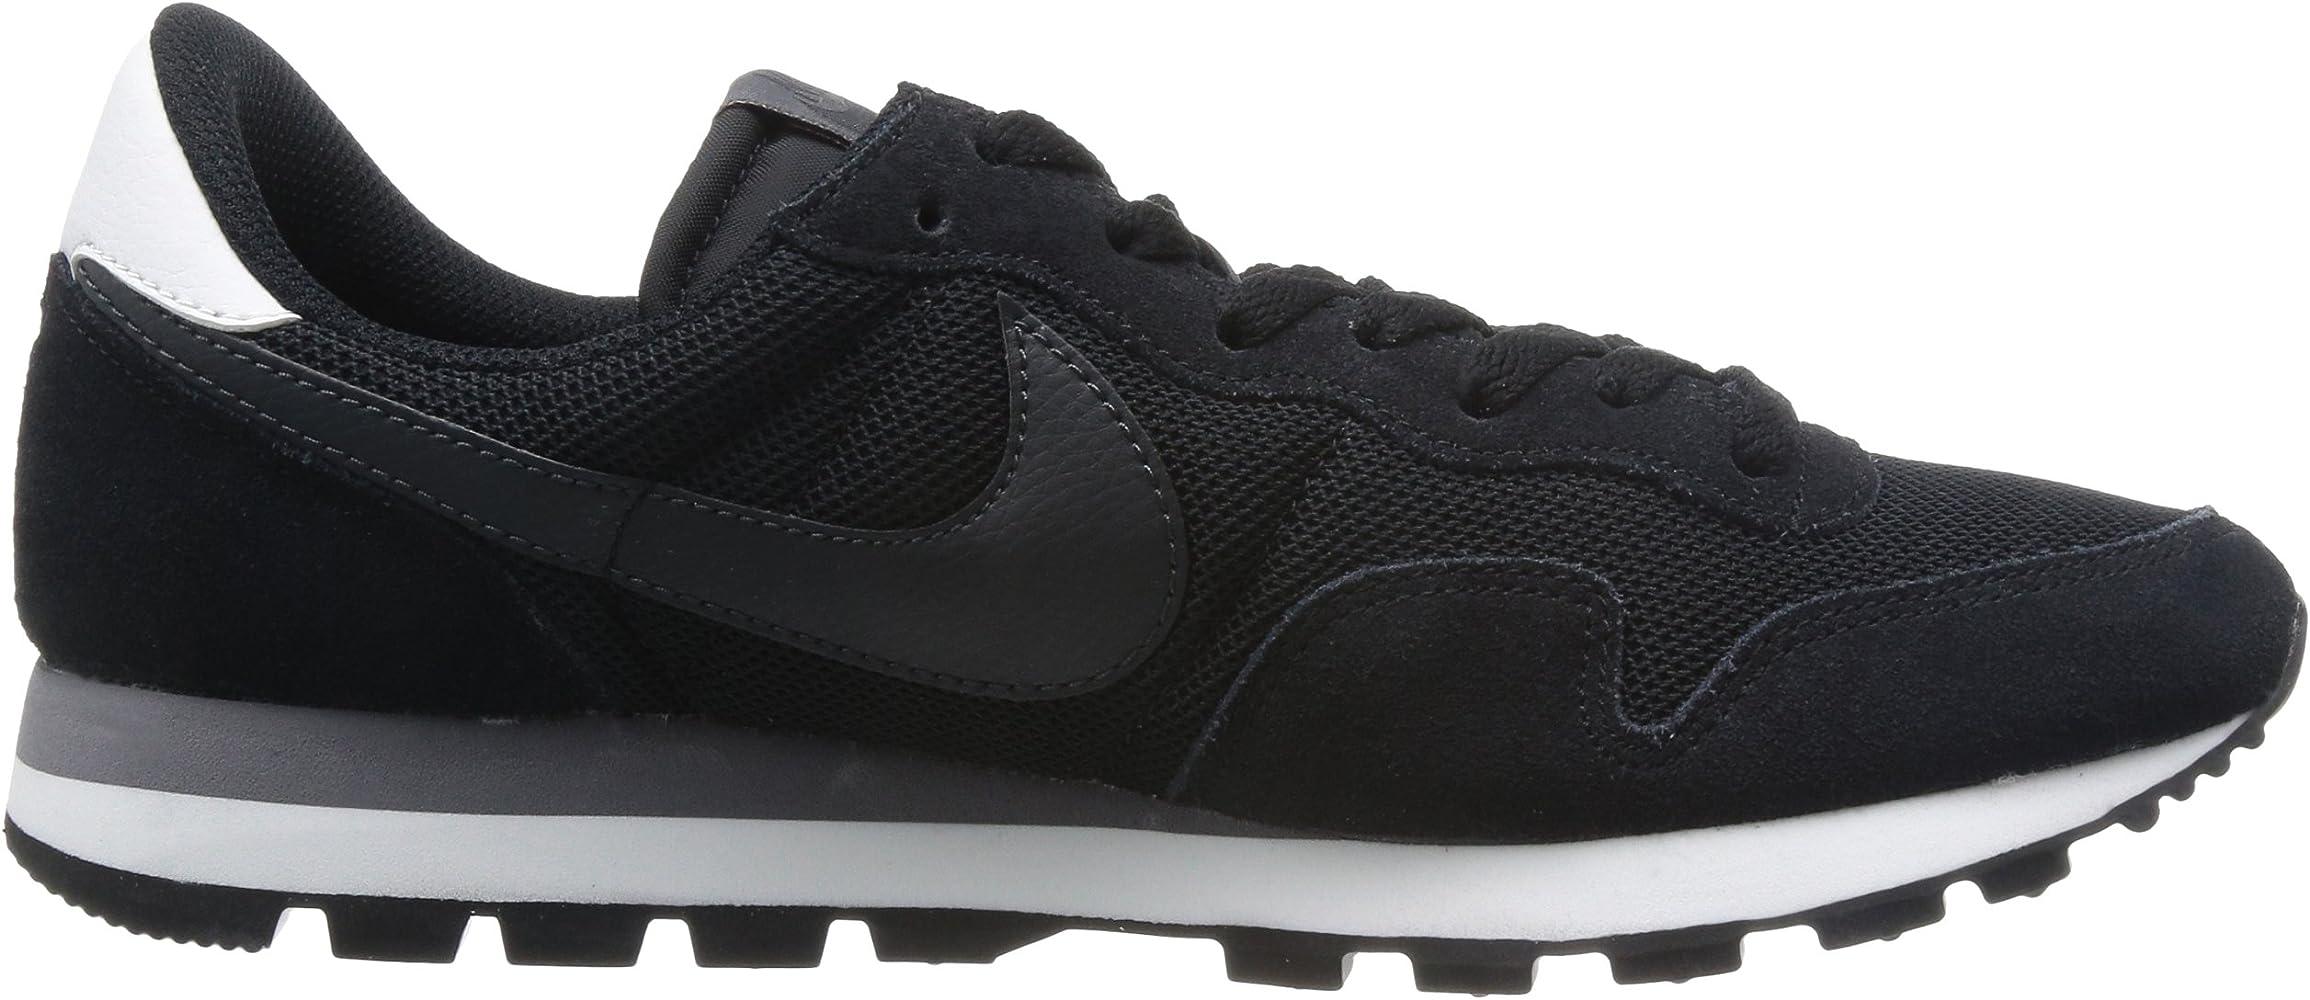 Nike Mens AIR Pegasus 83 Black/White 599124-003